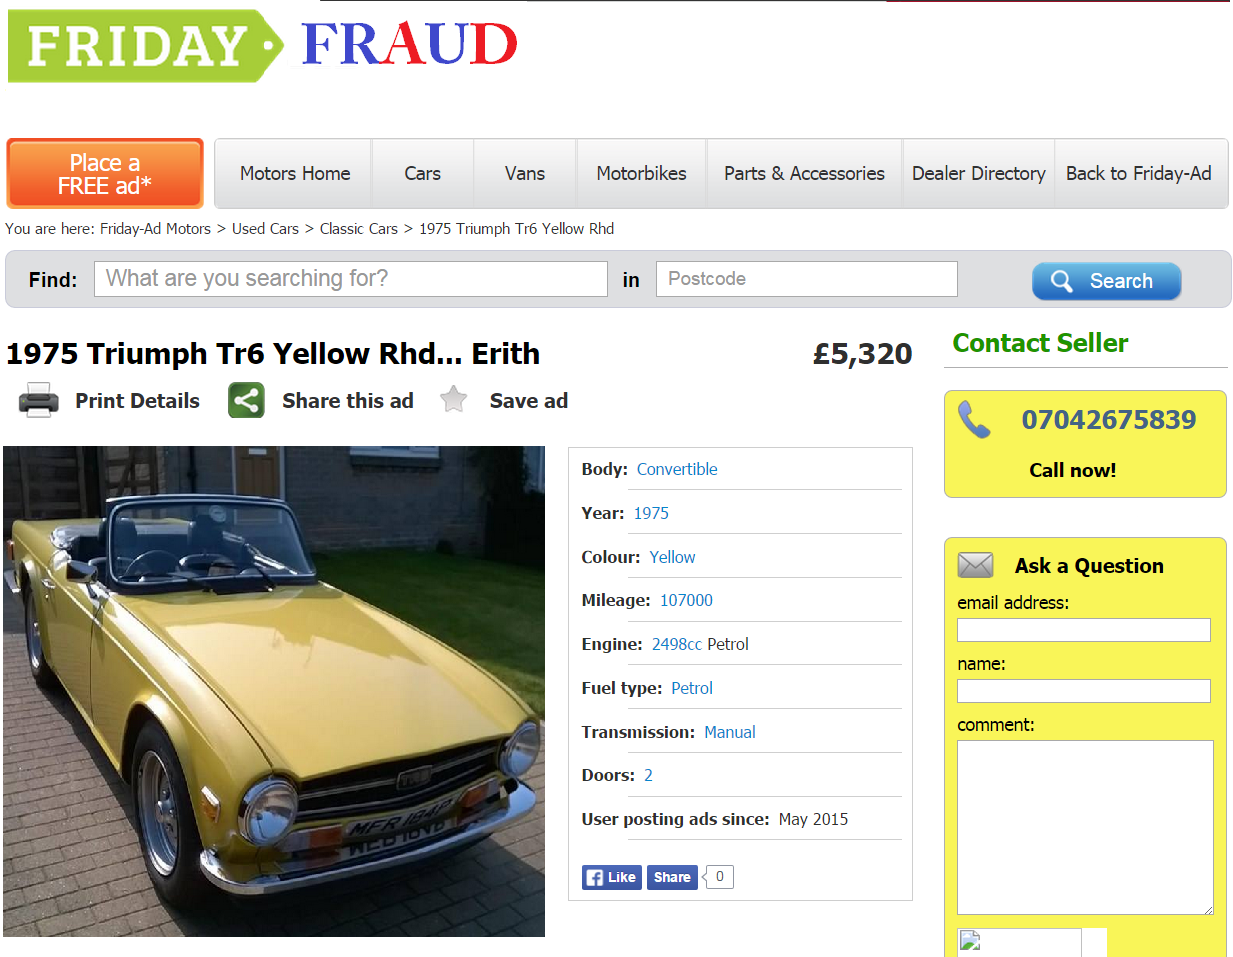 EBAY SCAM : 1975 TRIUMPH TR6 YELLOW   MFR184P - Fraud - MFR